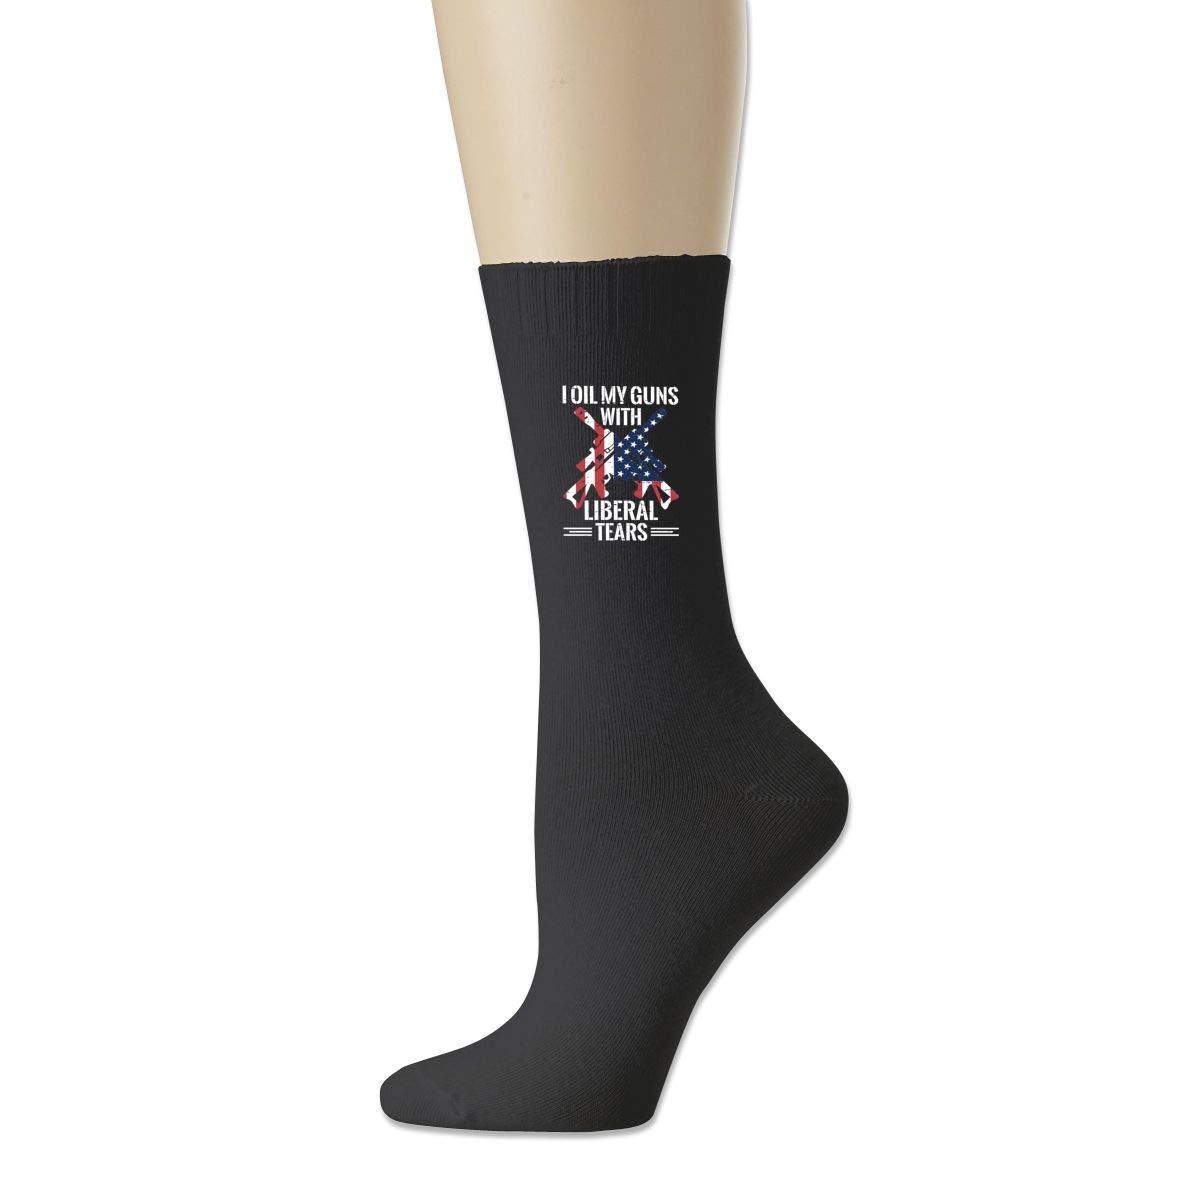 Cotton Crew Bobbysox Ski Socks Unisex Soccer Socks I Oil My Guns With Liberal Tears